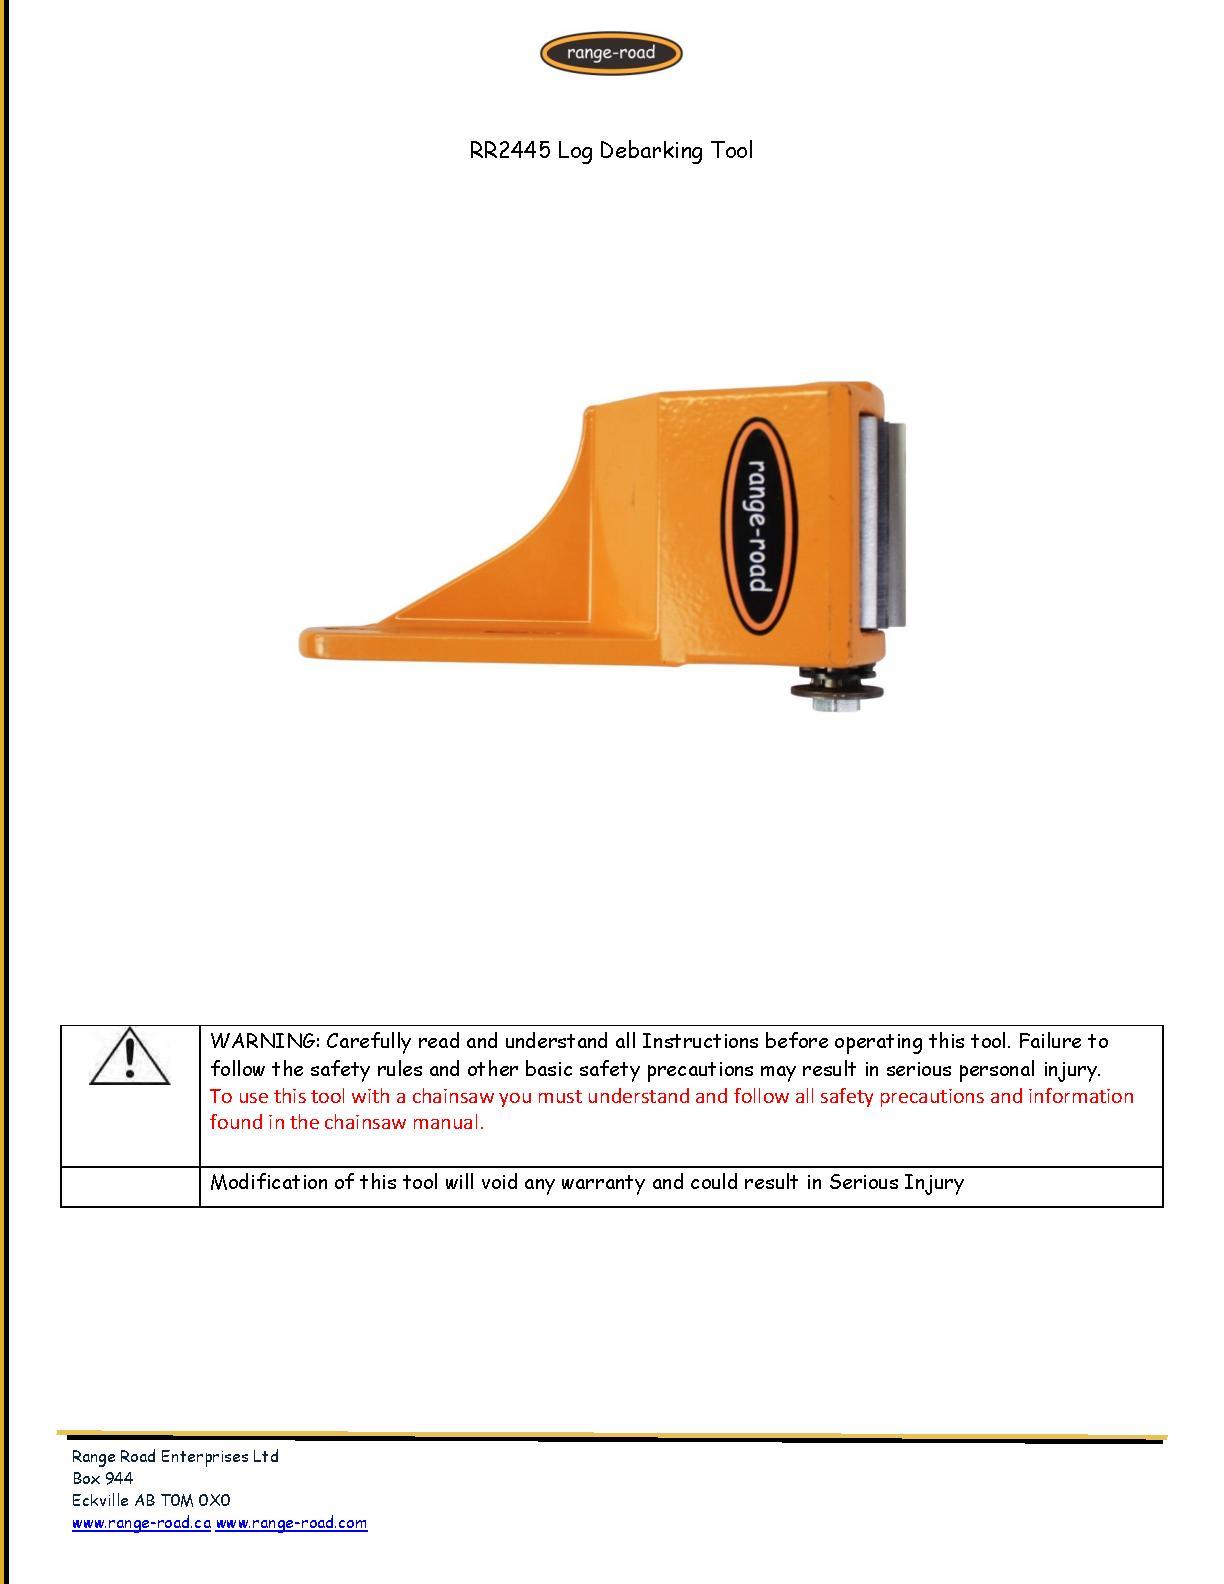 RR2445 Log Debarker Instructions.pdf   PDF Host